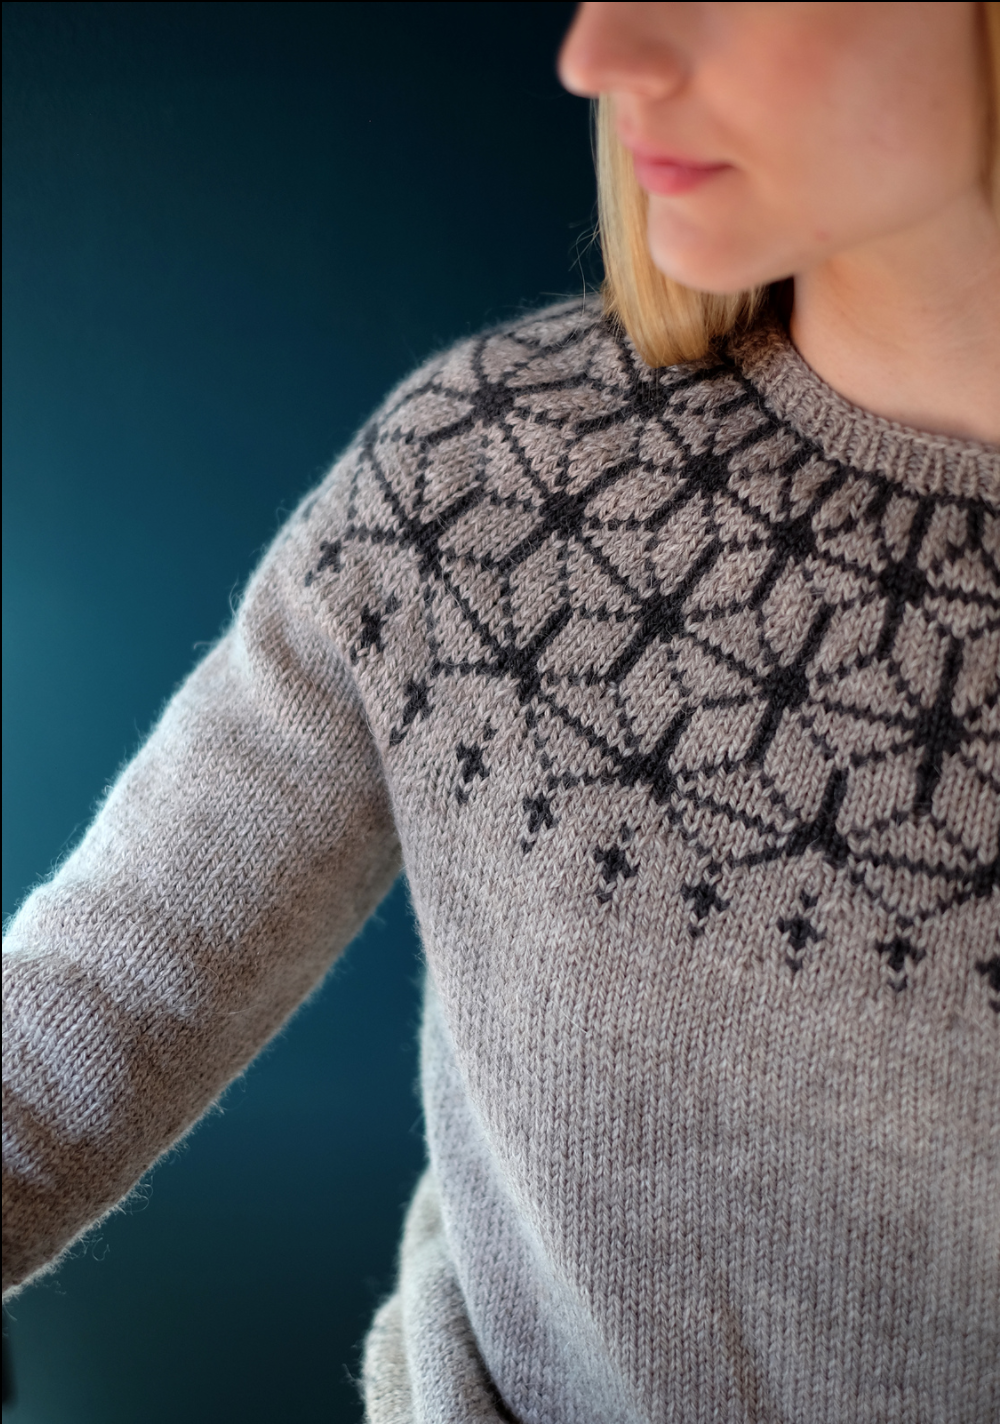 Tensho Pullover by Beatrice Perron Dahlen